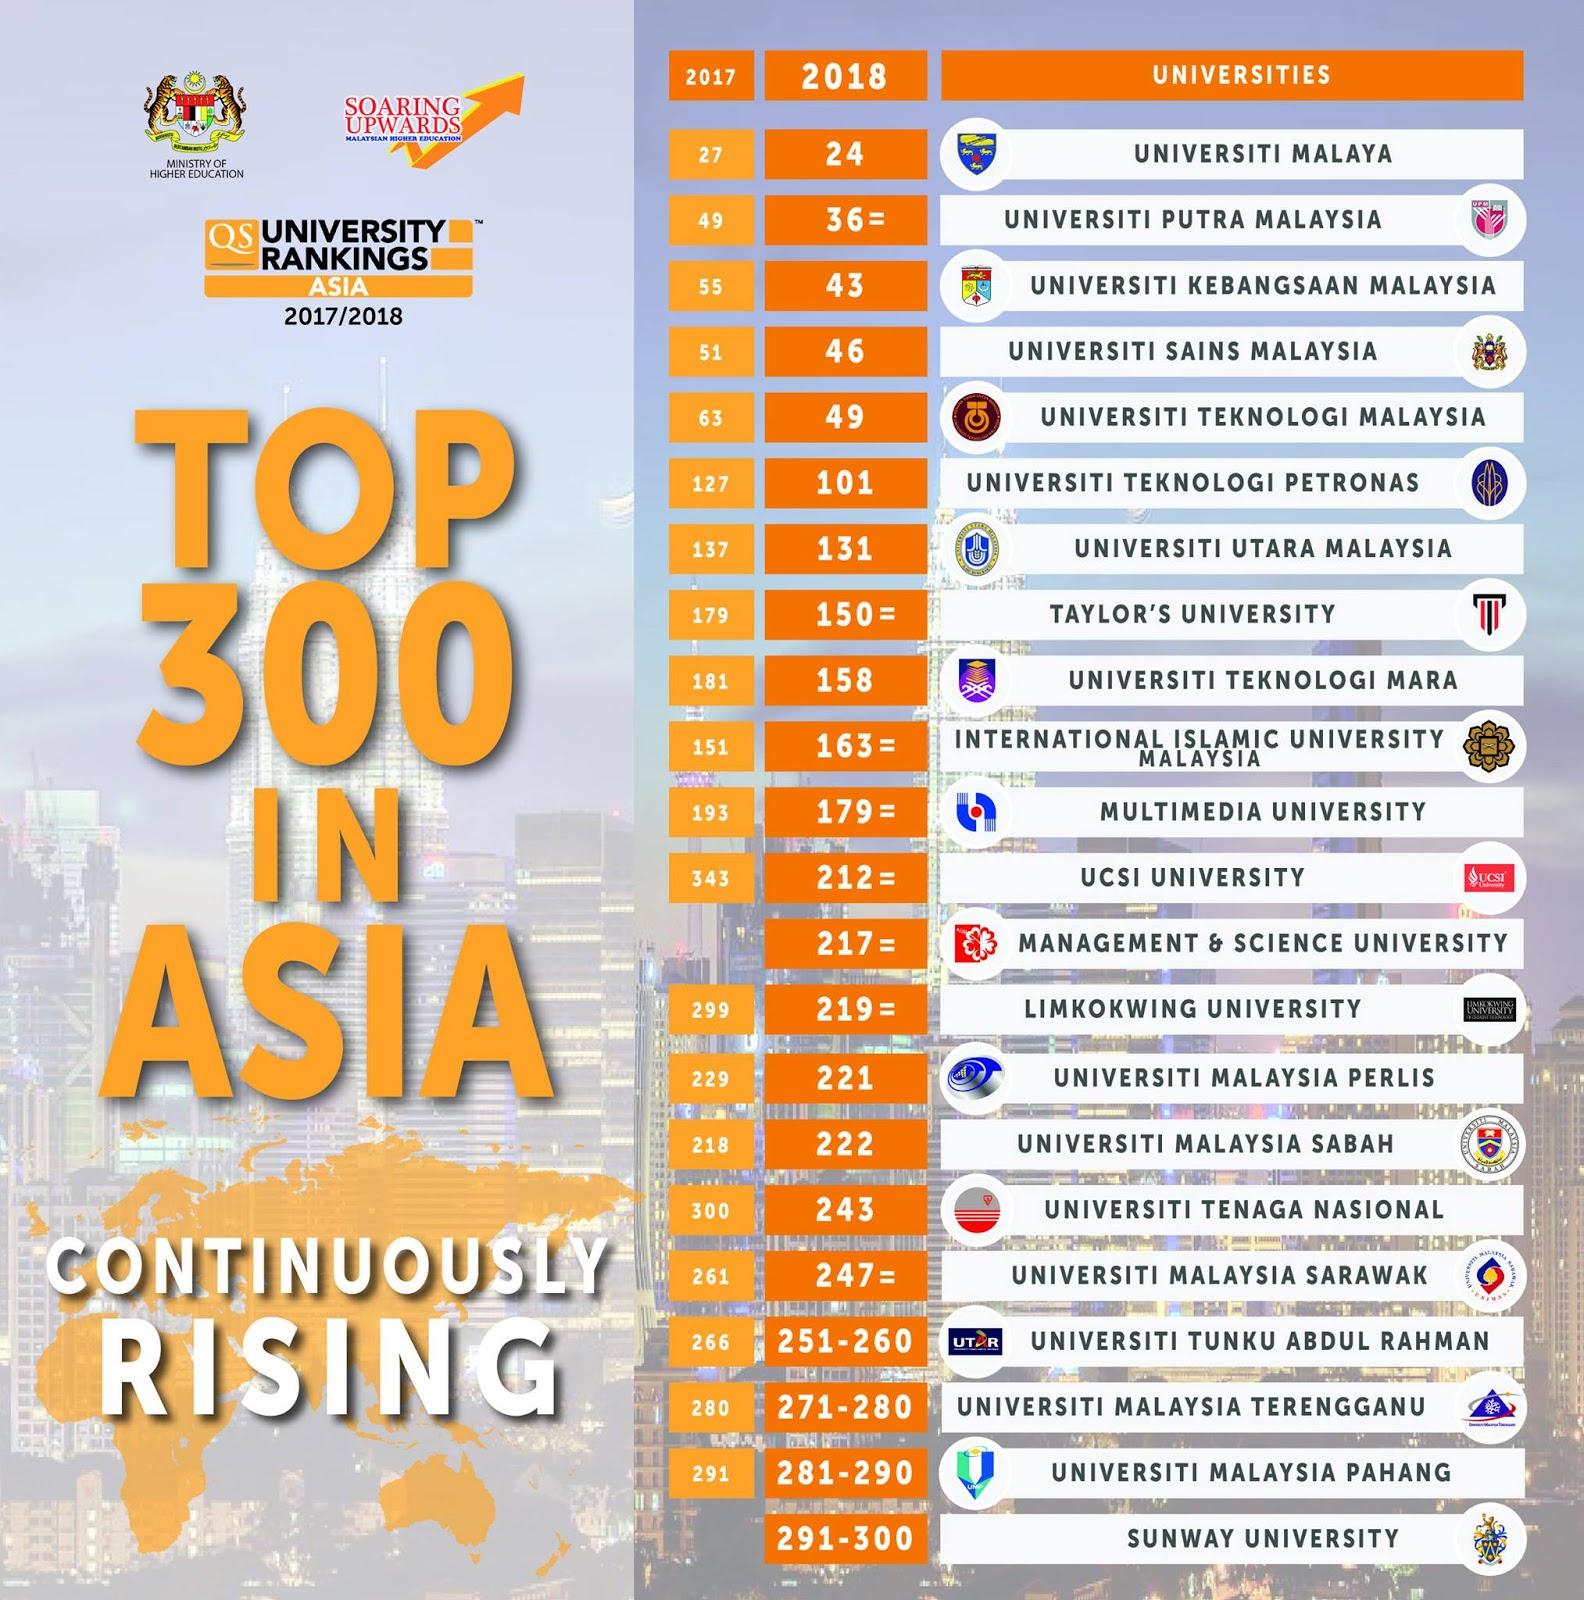 Ranking Universiti Di Malaysia 2018 Berdasarkan Qs World University Ranking Asia 2018 Makmal Informasi